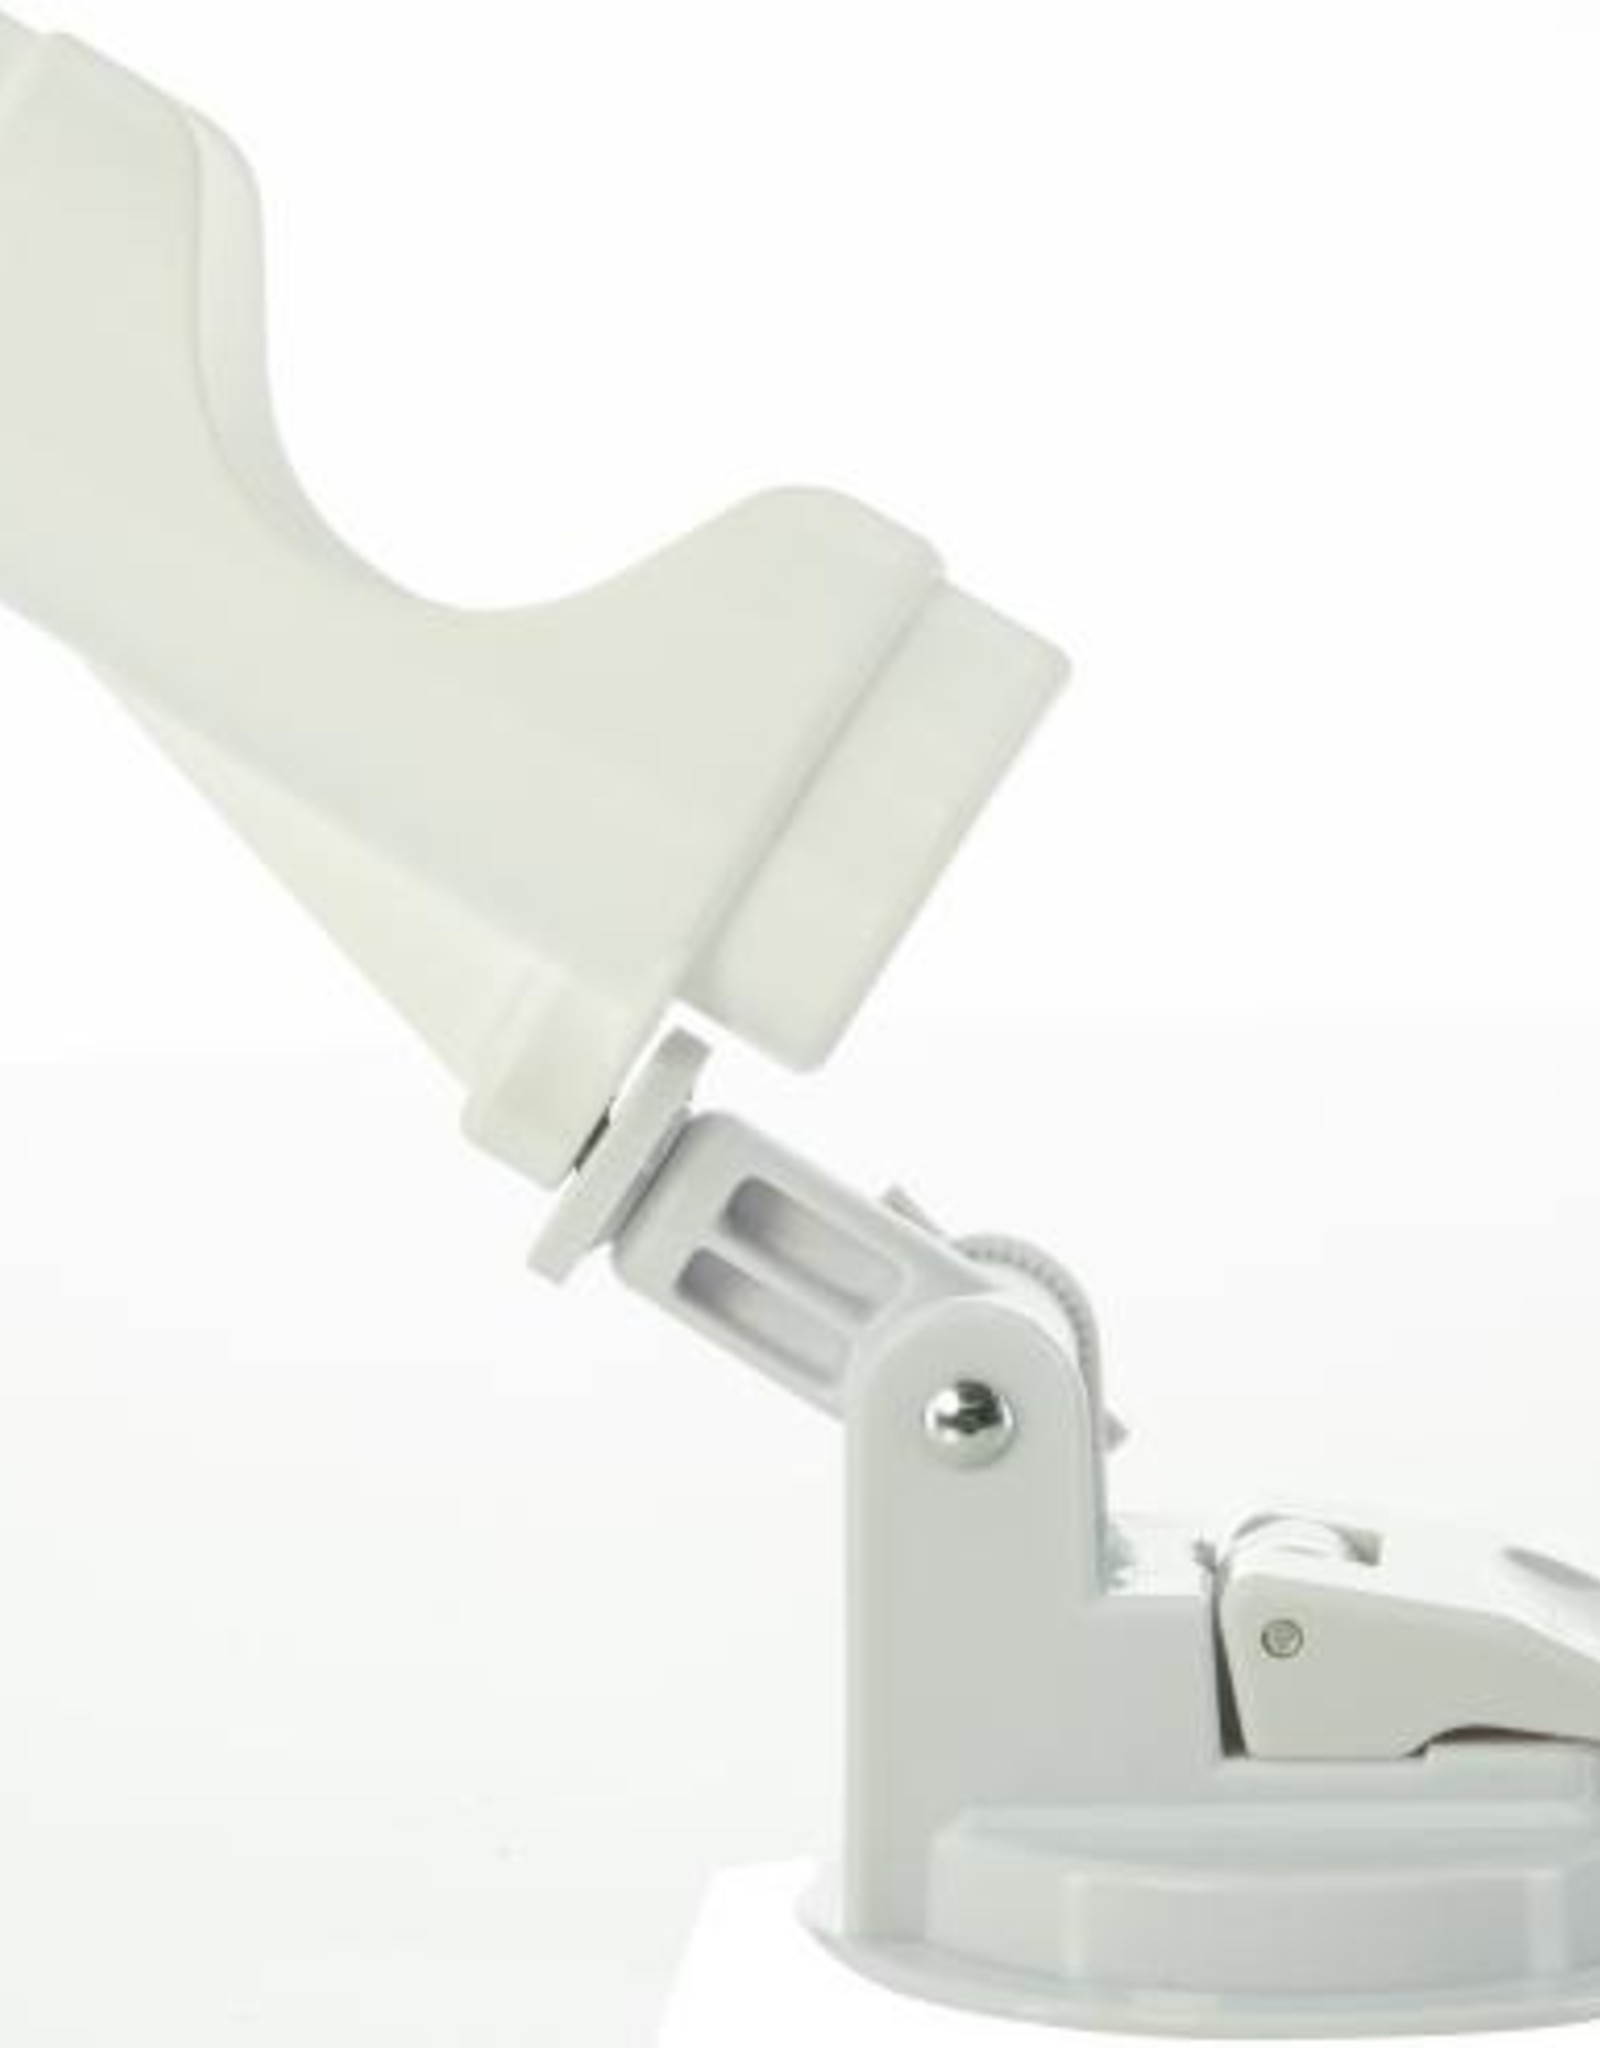 Pillow Talk Feisty Stotende Vibrator - Pink